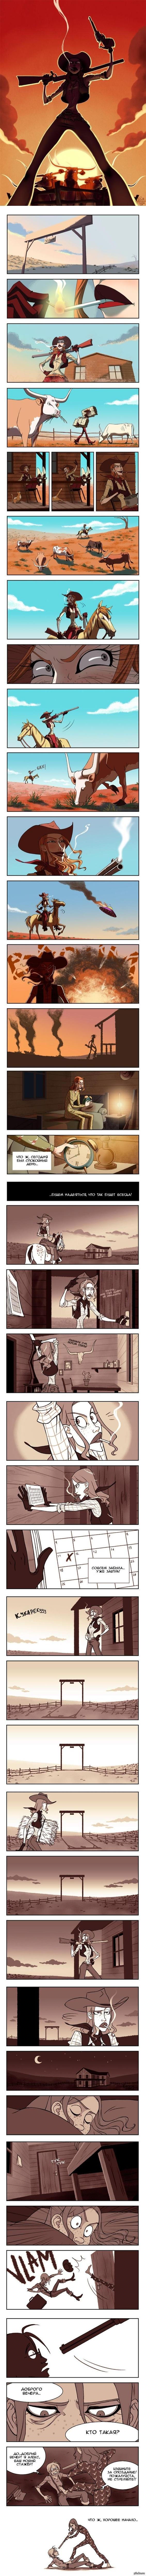 JO - Ковбои против Пришельцев (Страница 1 - 15) Перевод - Fantast-kun